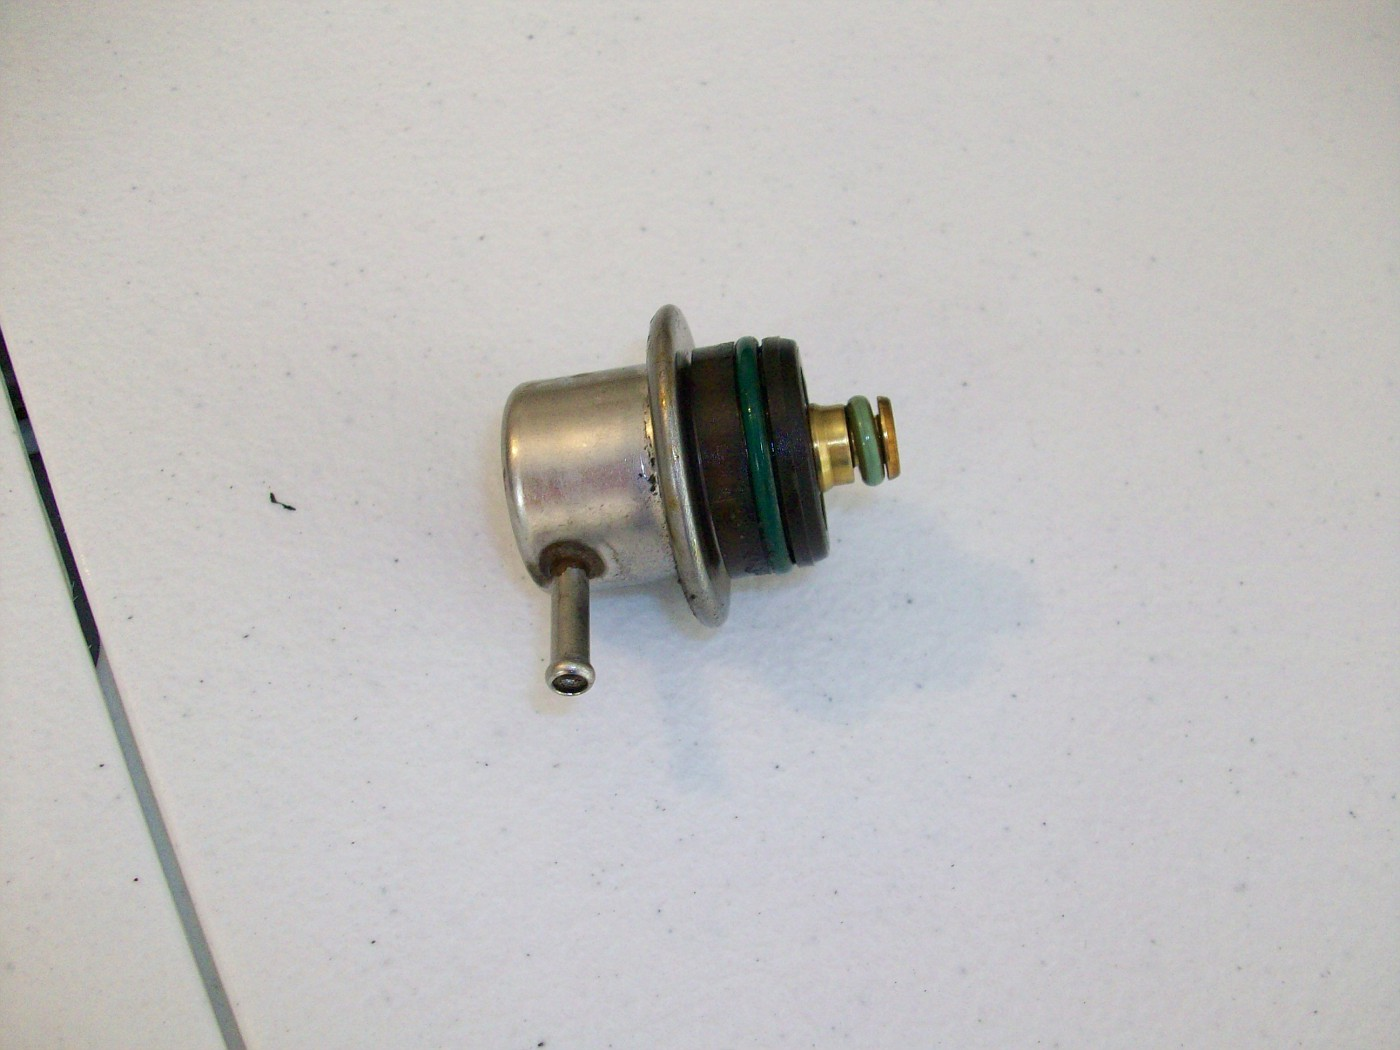 $10 OEM Fuel Pressure Regulator - Used (original part on car)